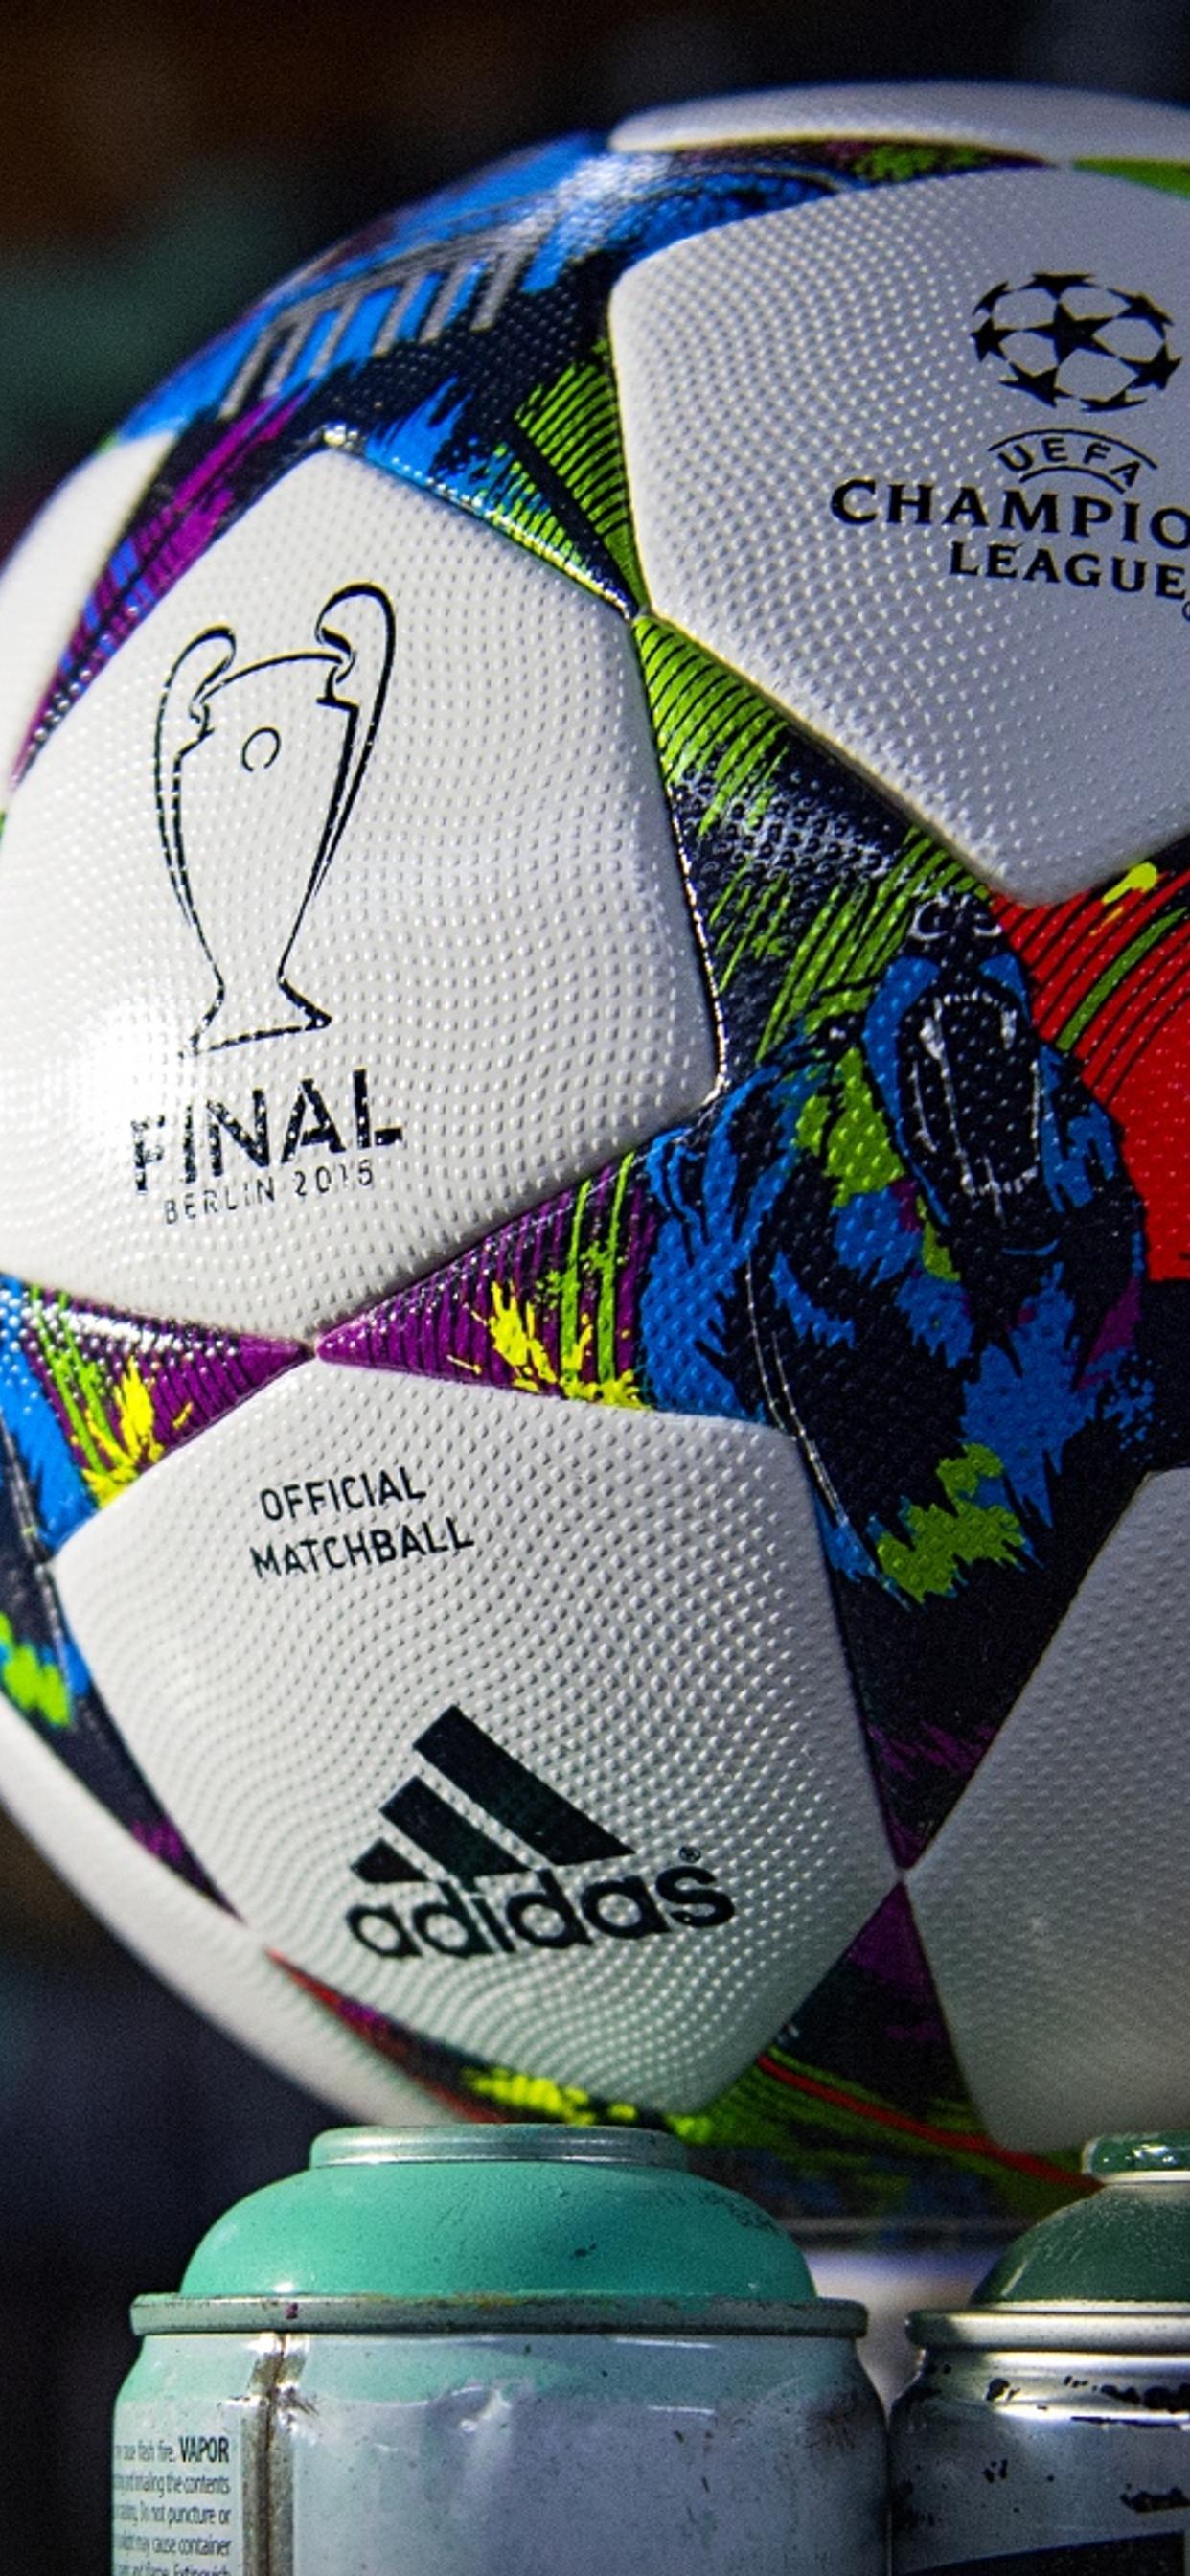 uefa champions league ball football wallpaper uefa champions league ball football